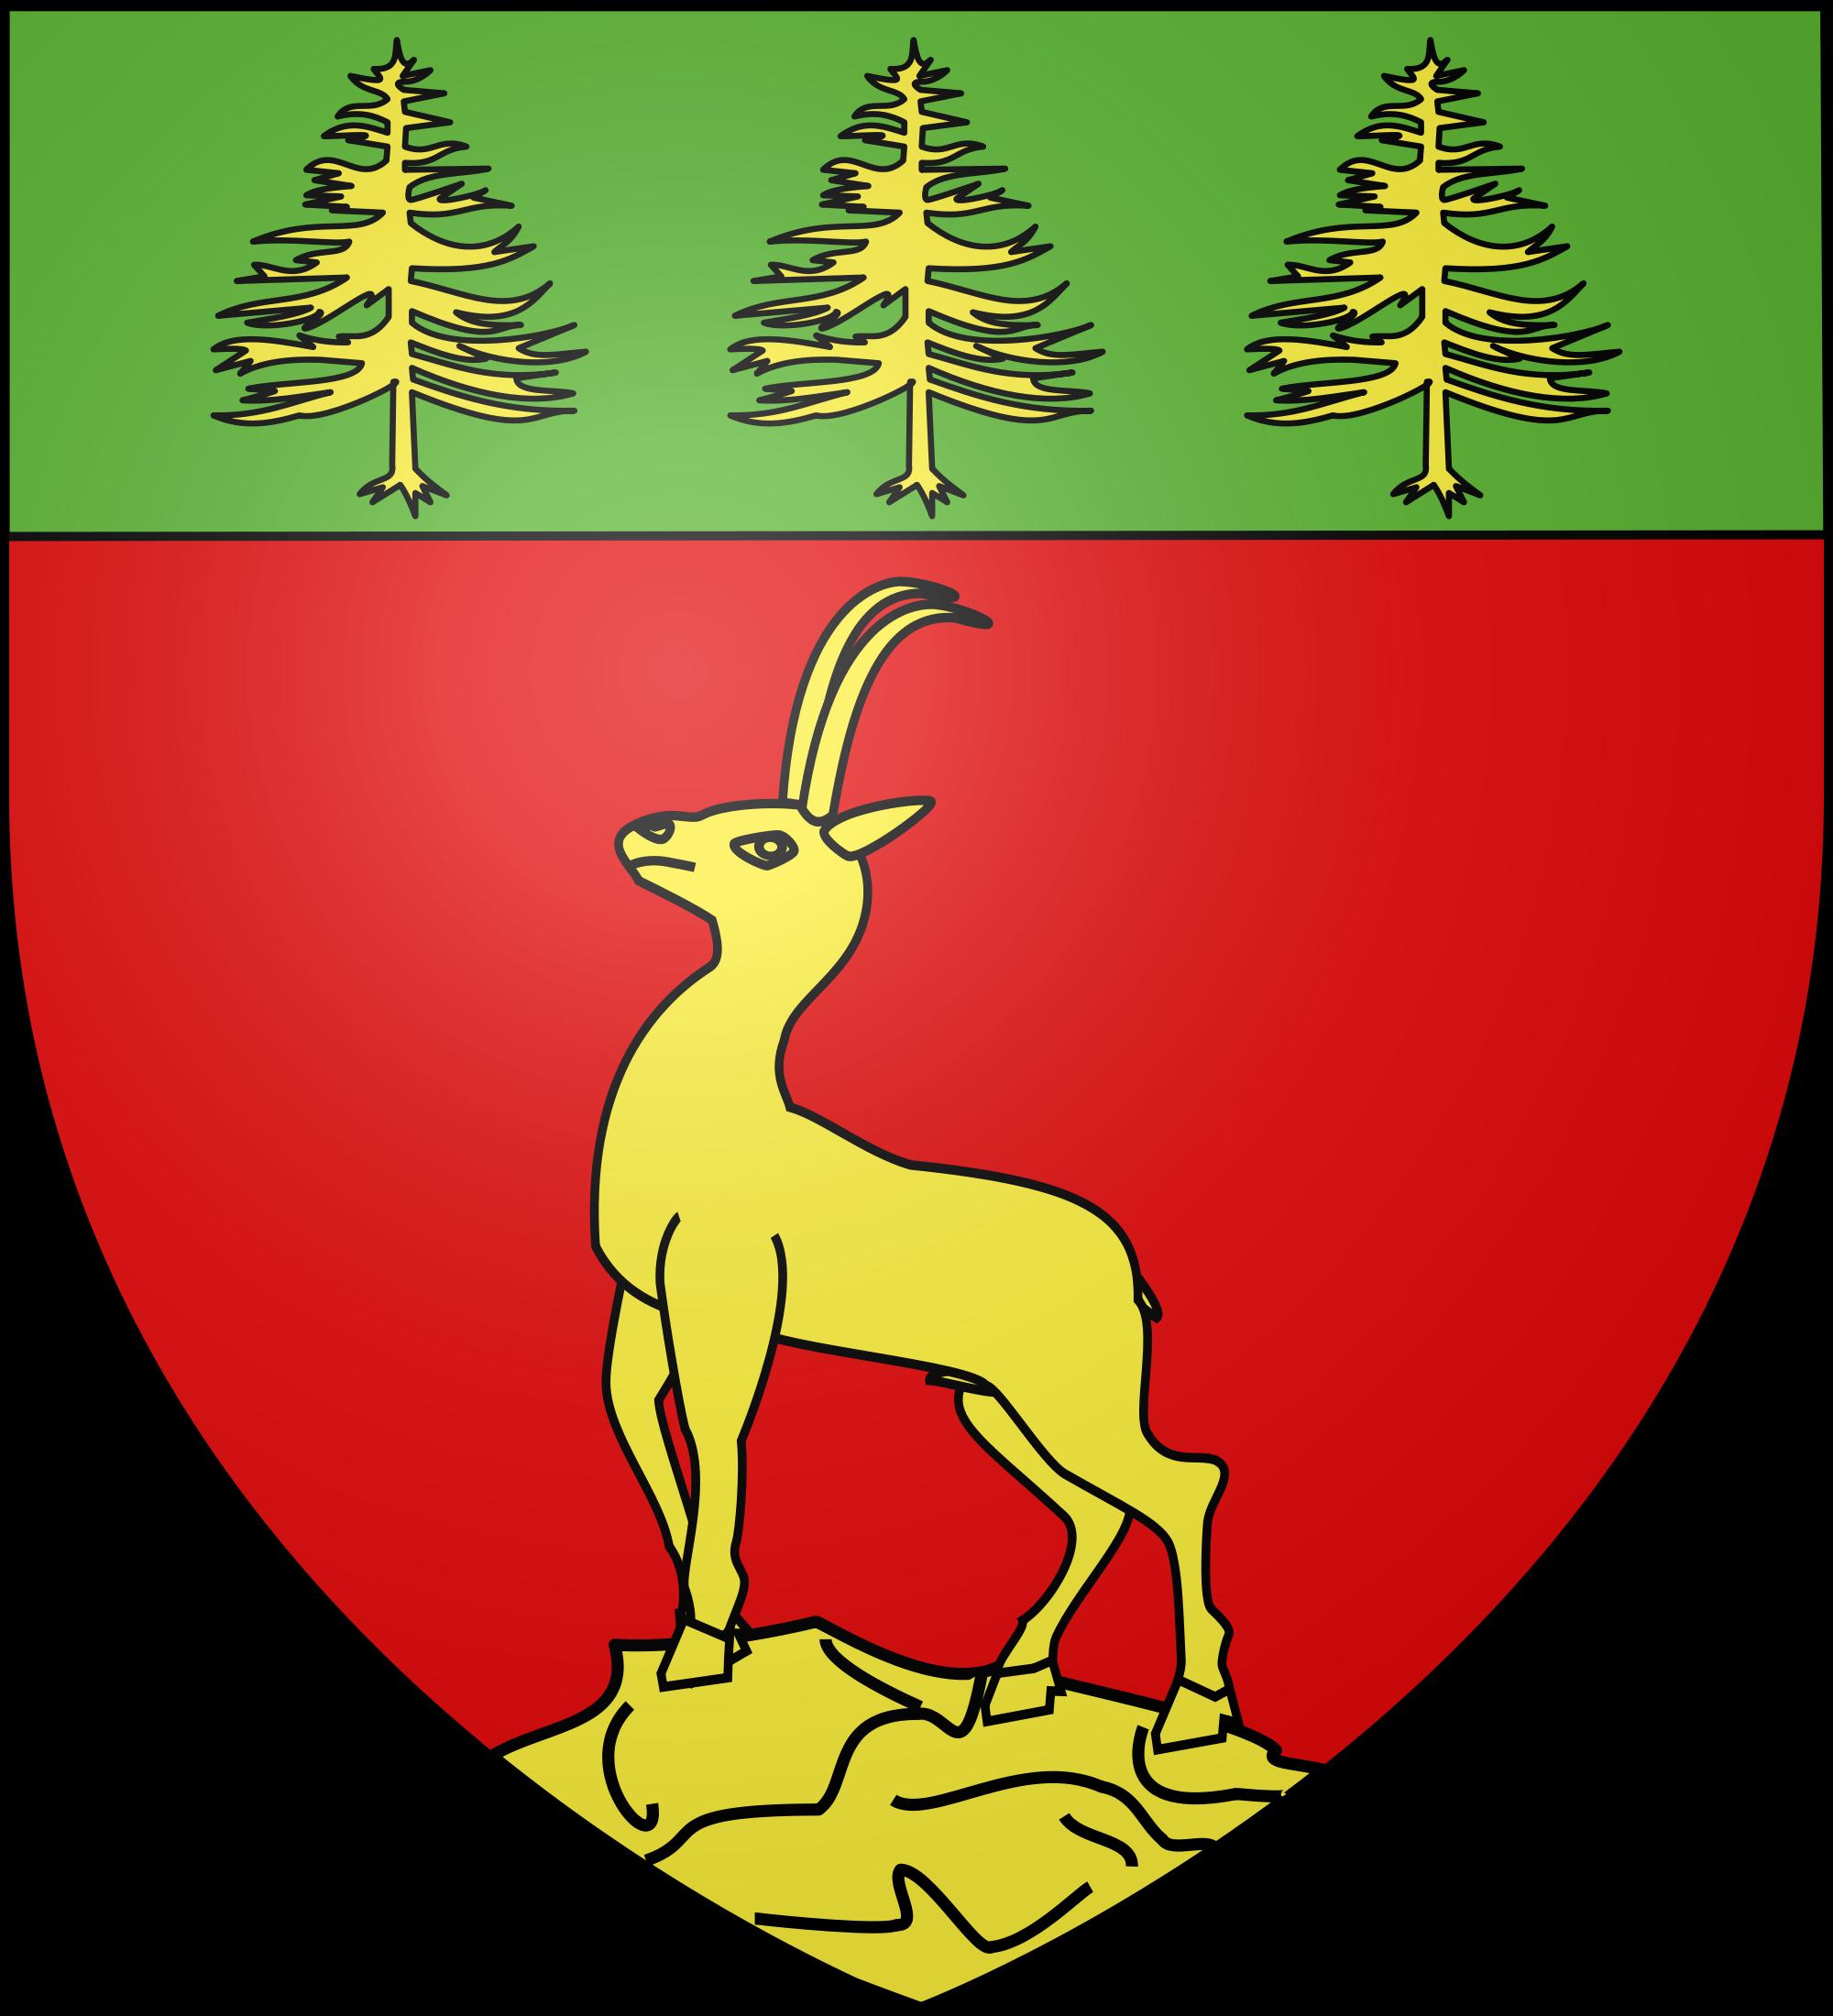 File:Blason ville fr La Chapelle.